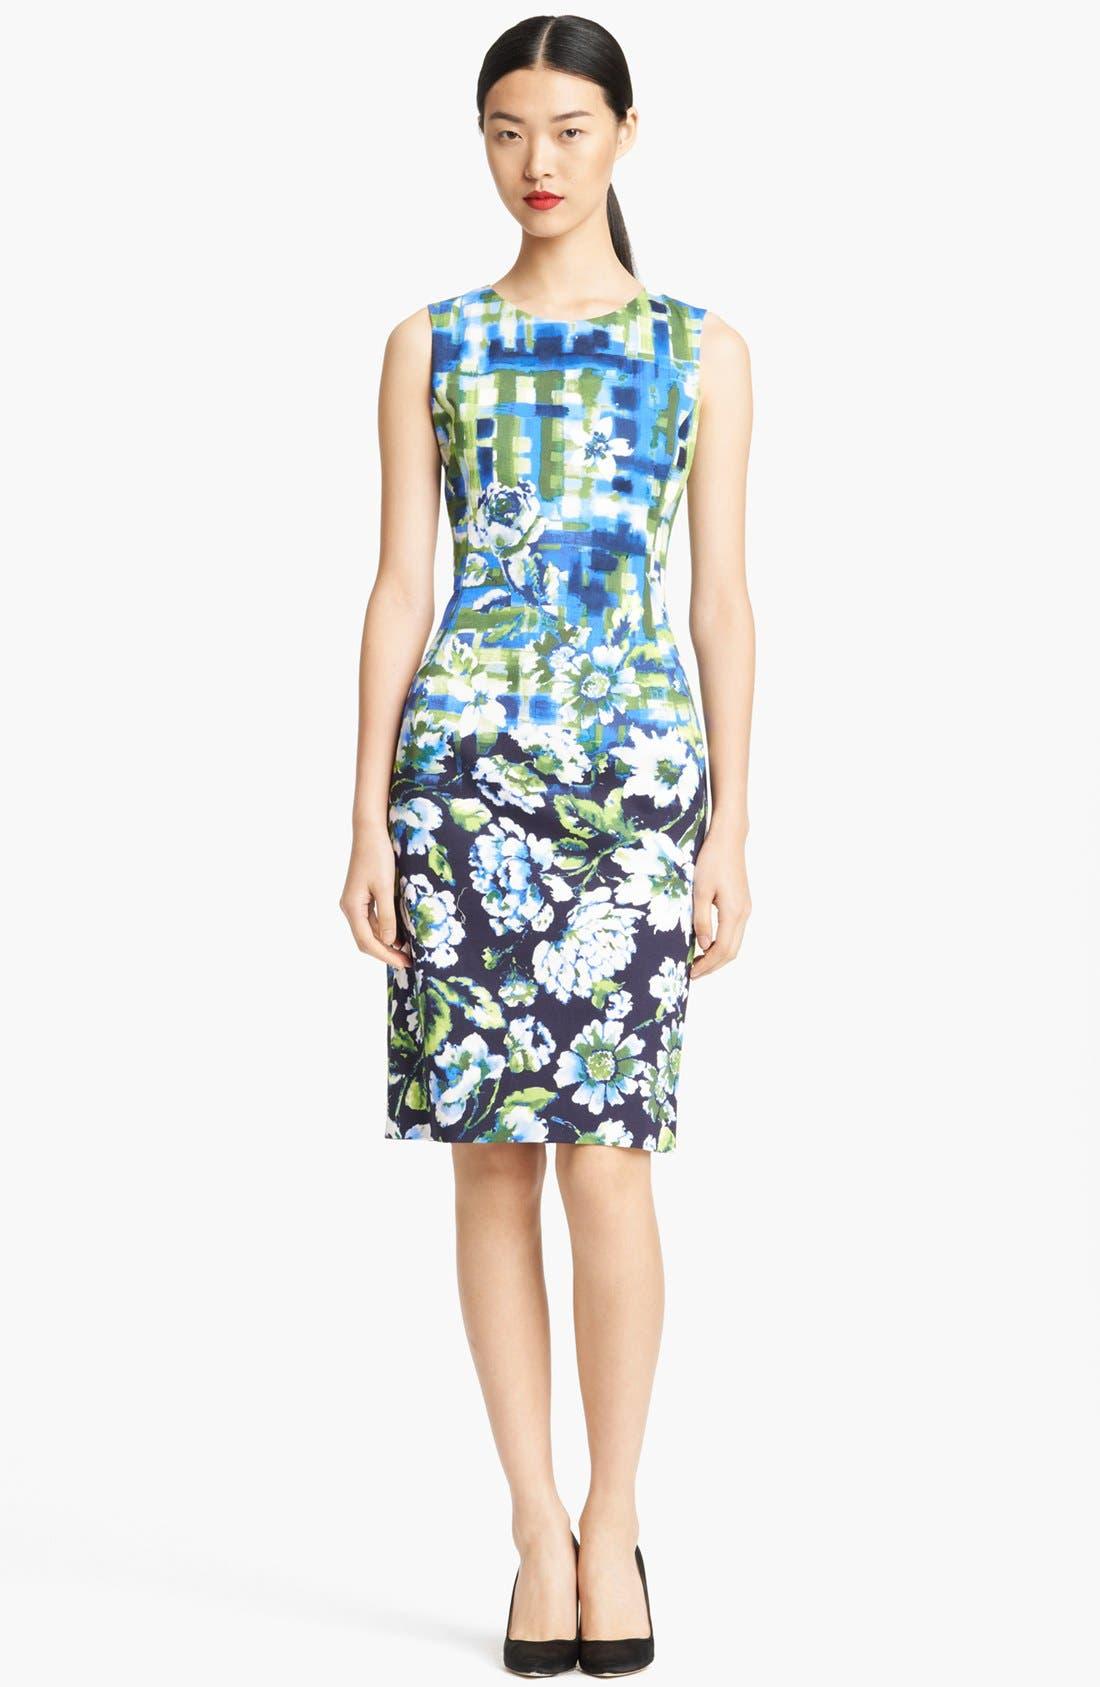 Main Image - Oscar de la Renta Painted Floral Print Sheath Dress